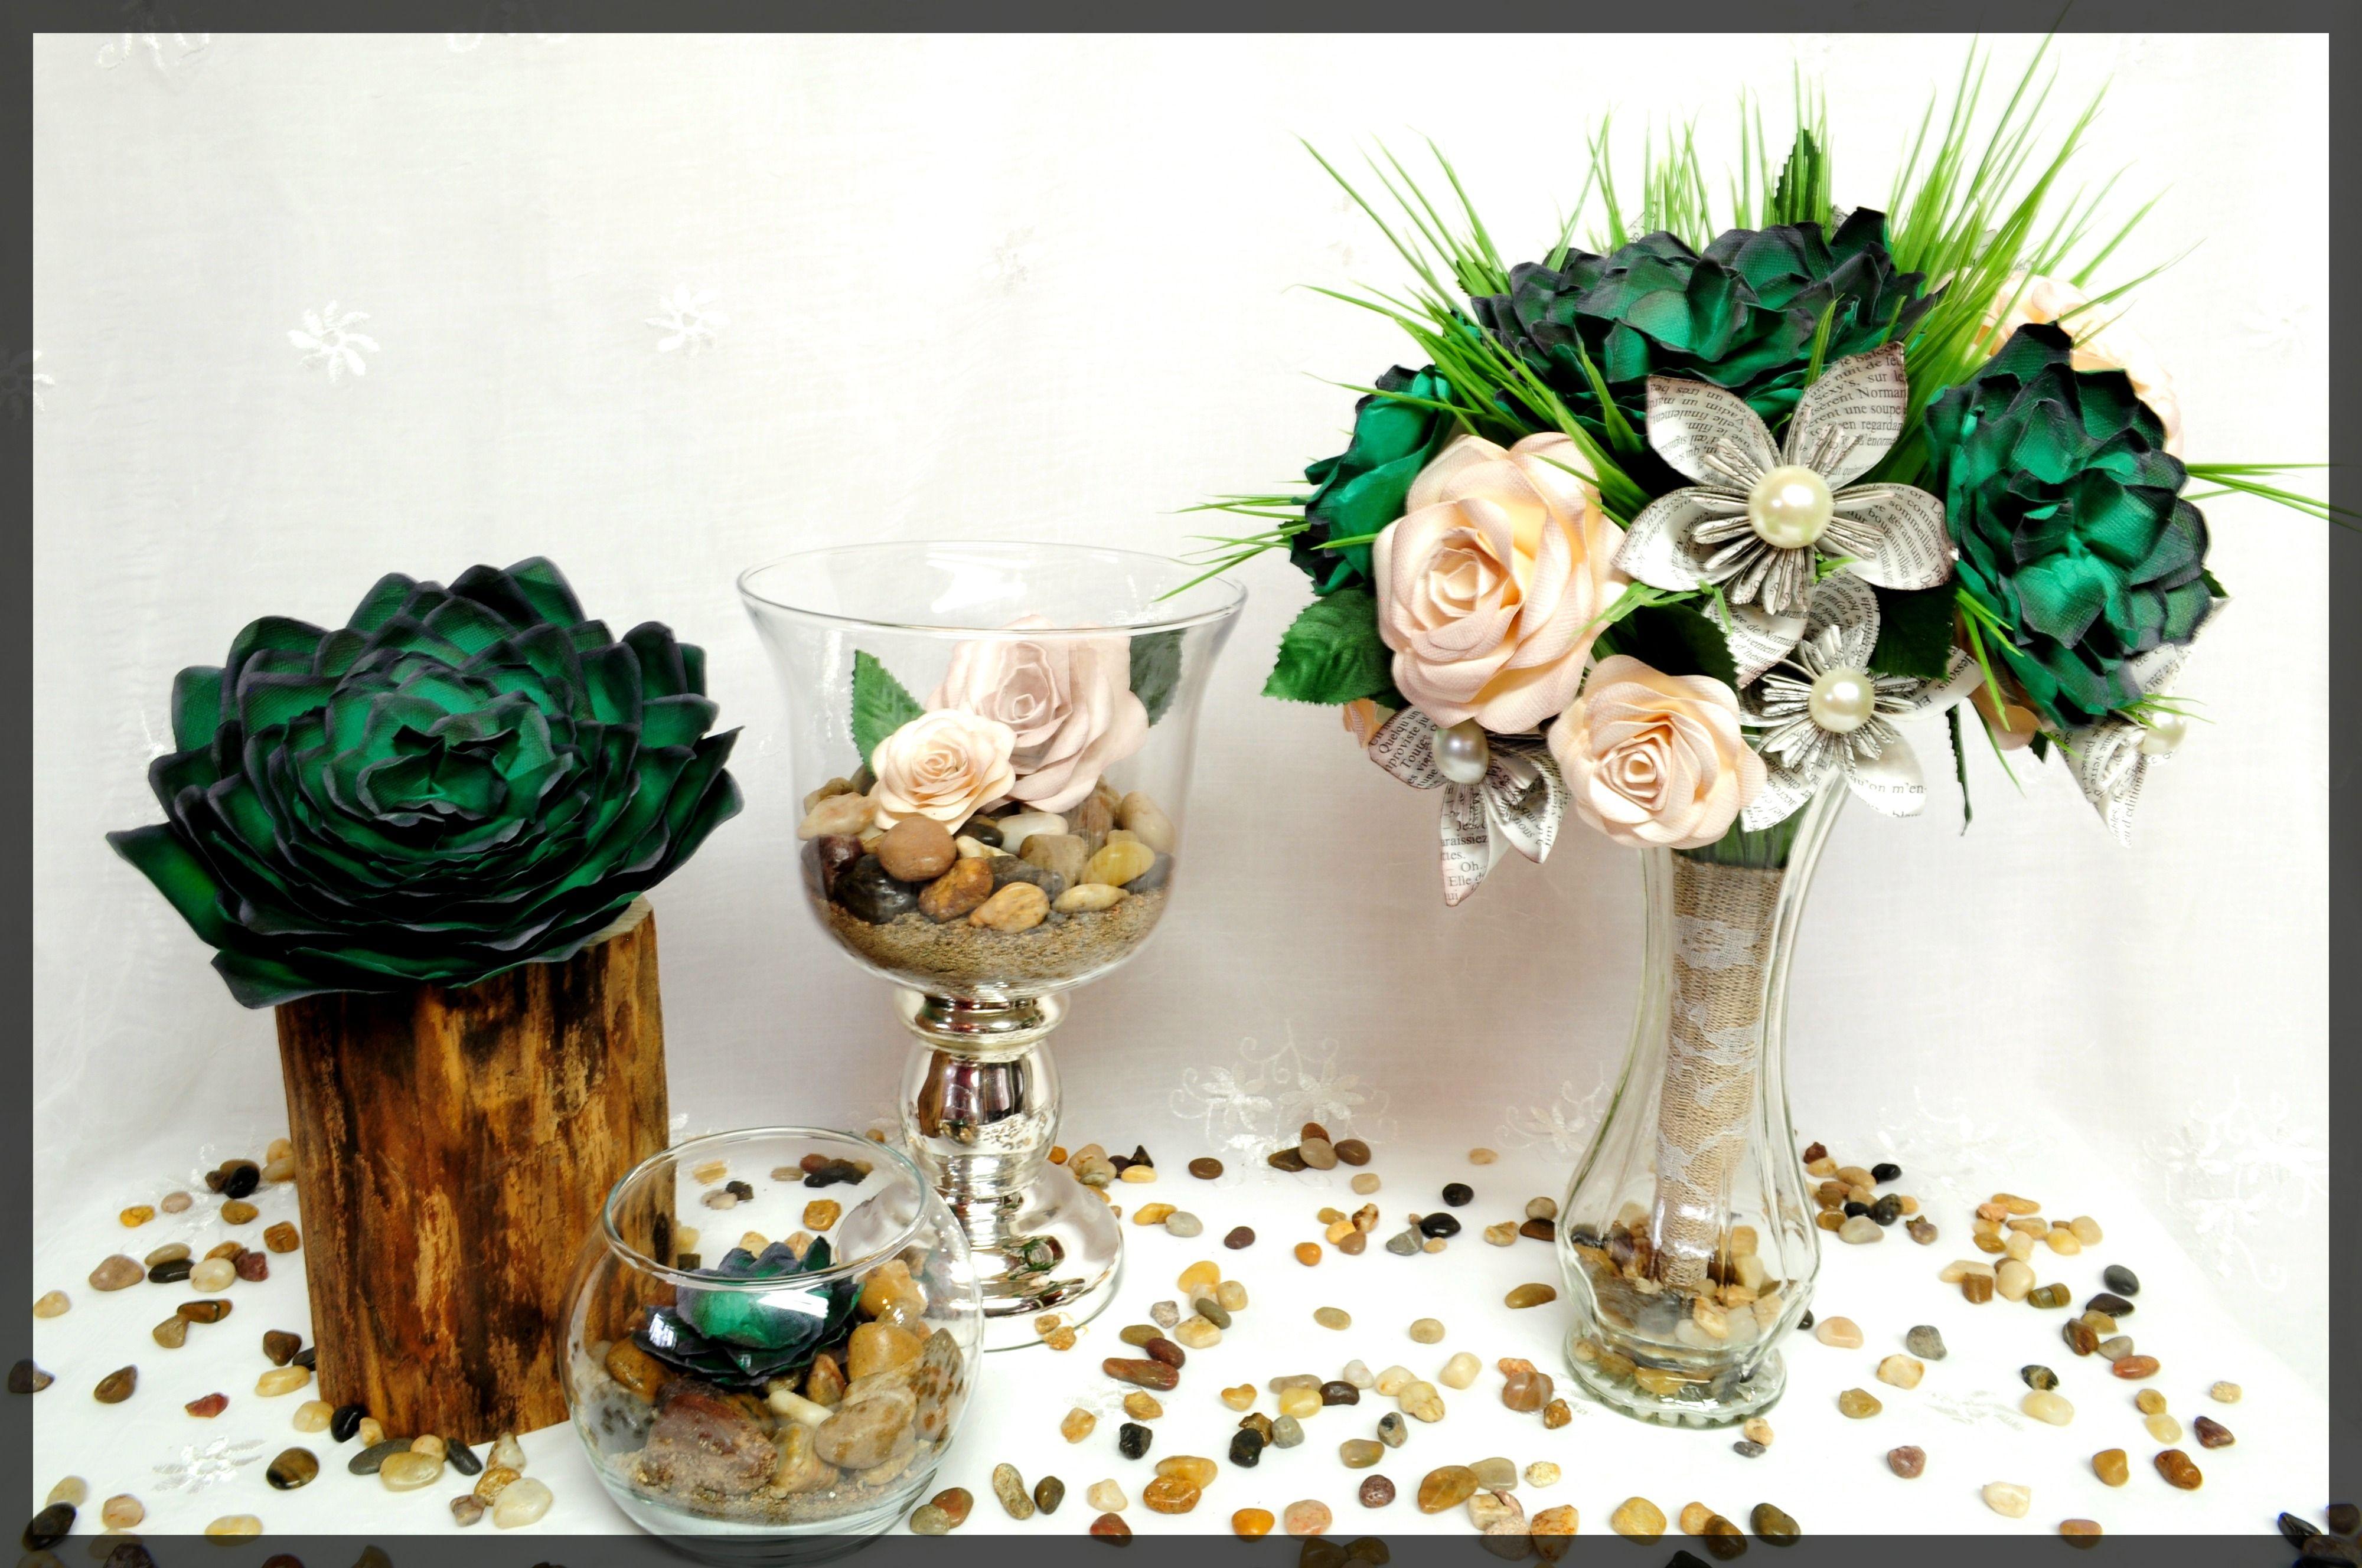 Mariage Boheme Succulente Plante Grasse Cactus Mariage Rose